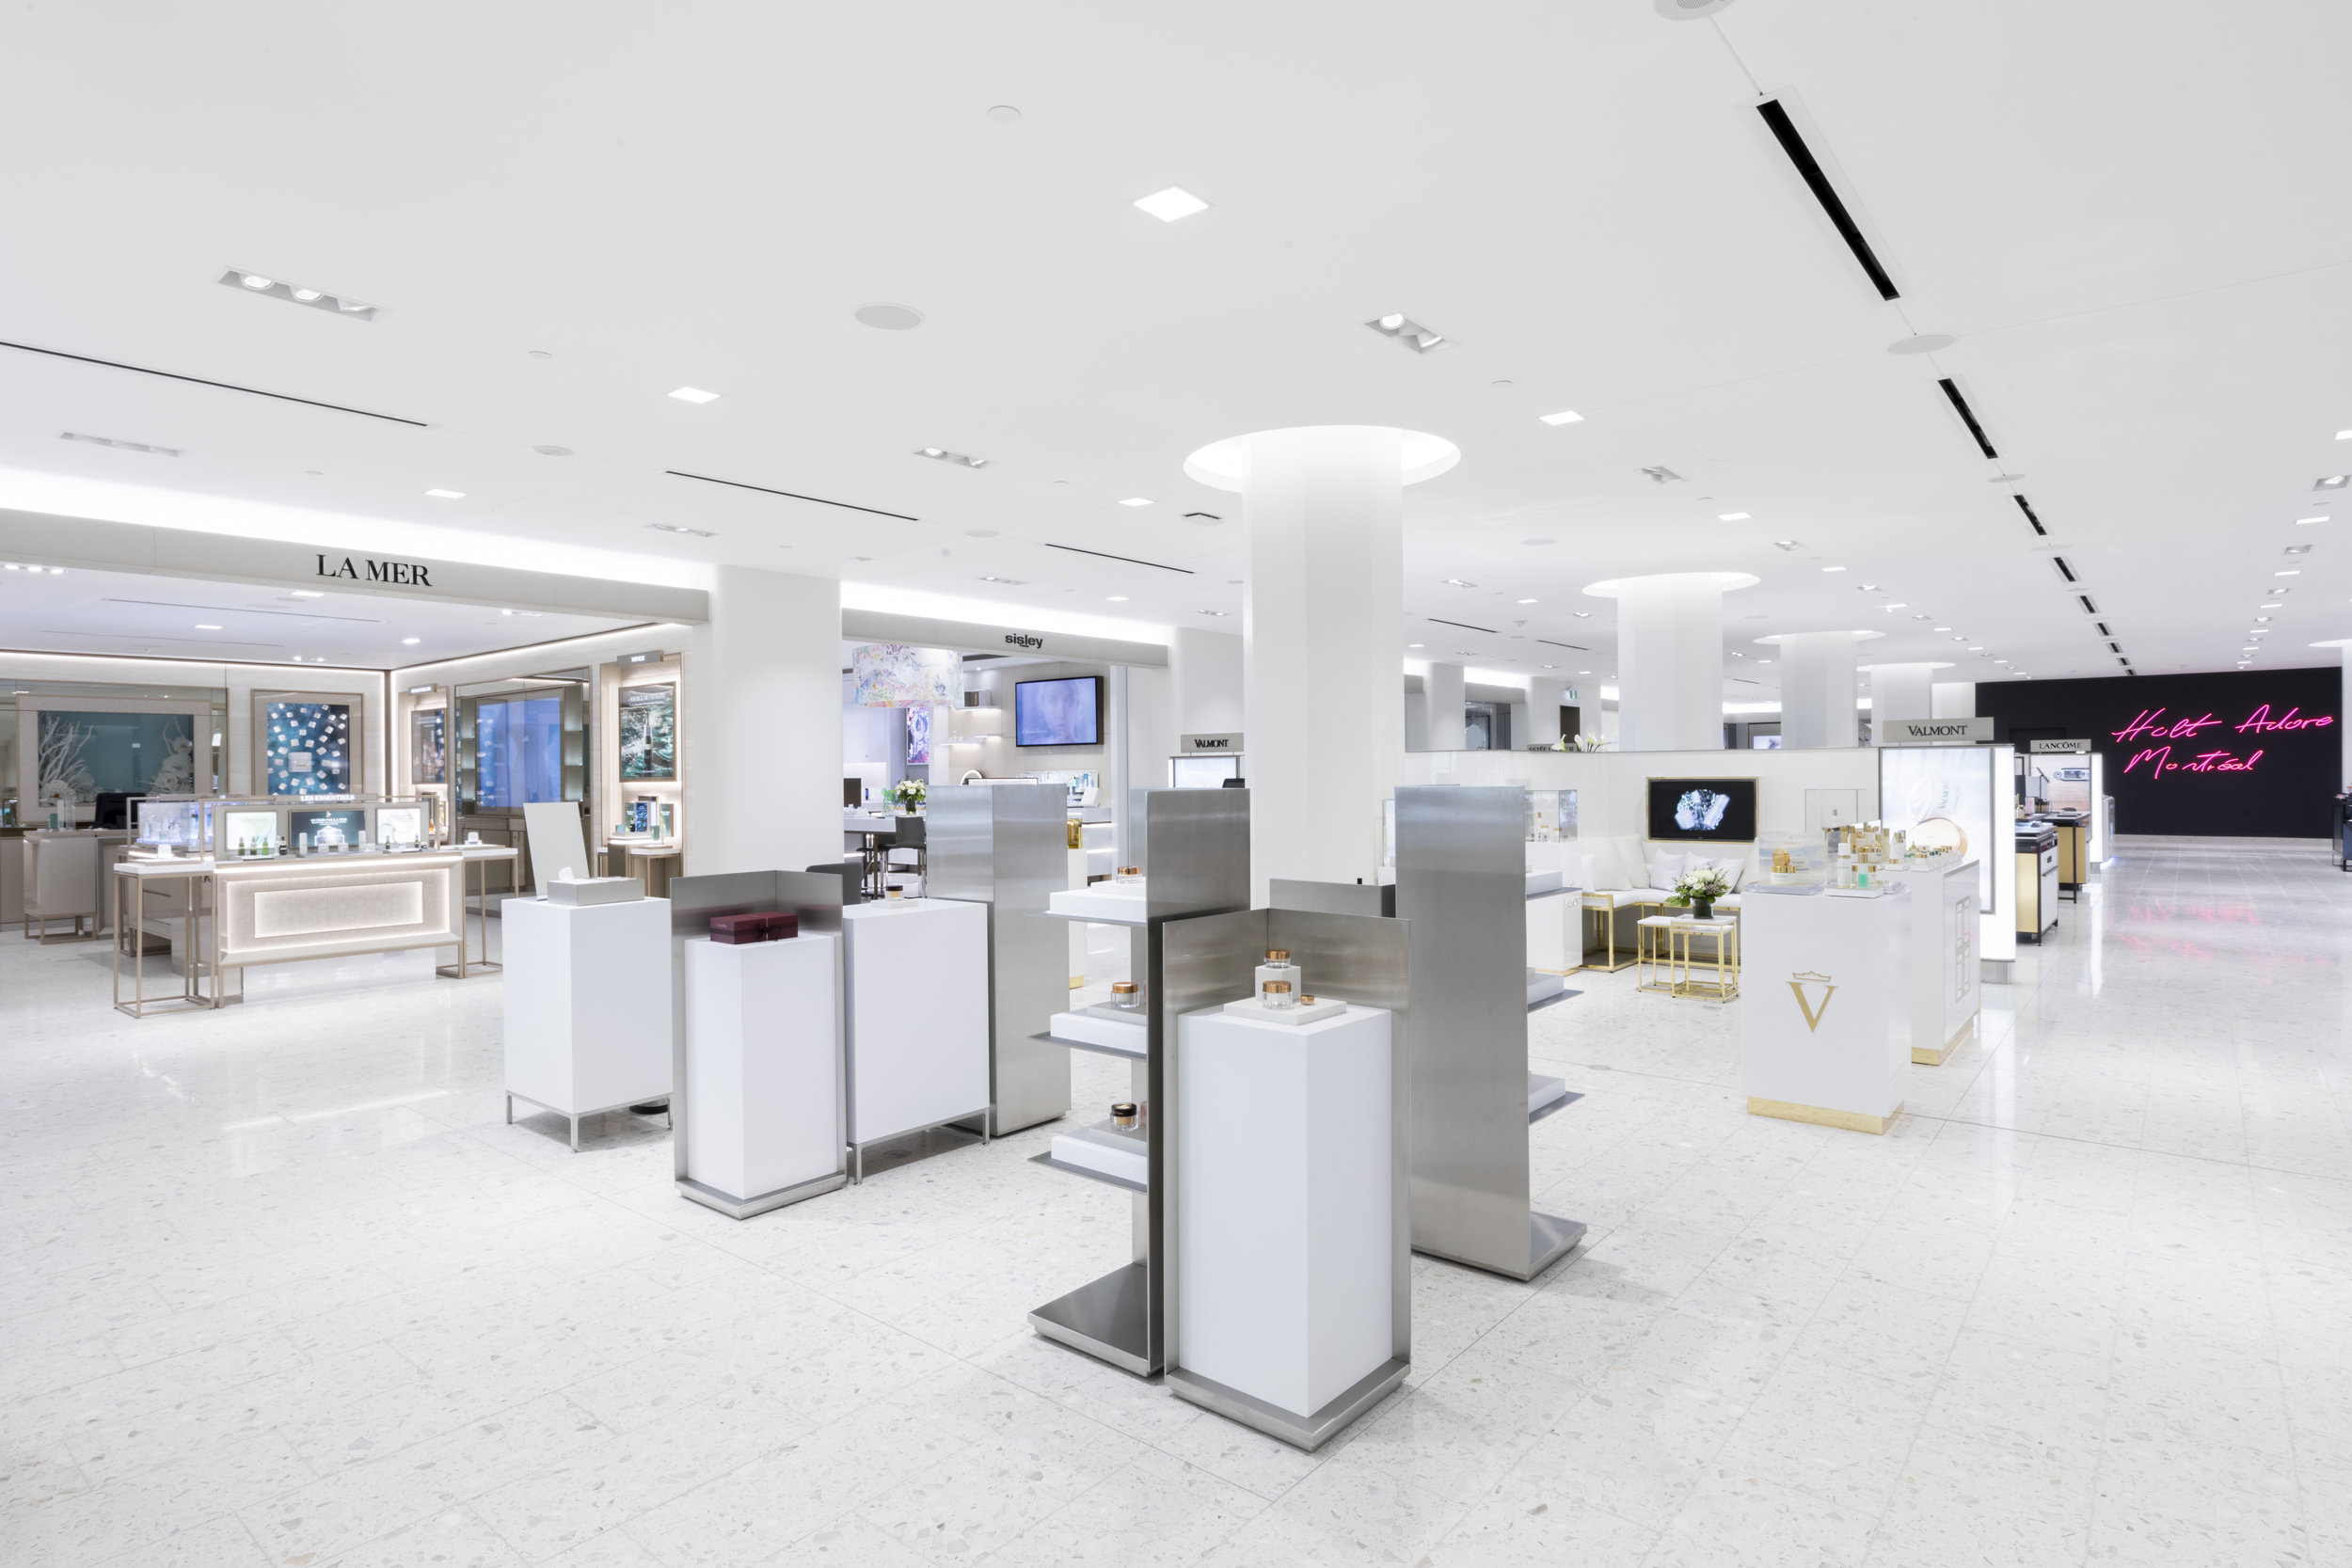 New concourse-level beauty hall. PHOTO: holt renfrew ogilvy